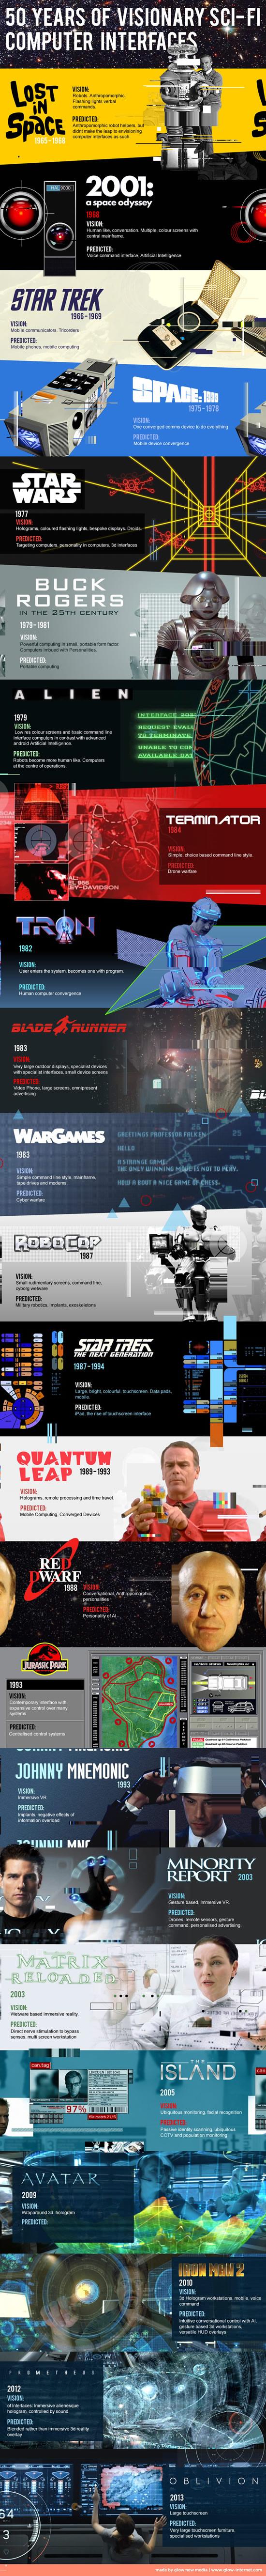 Sci Fi Infographic